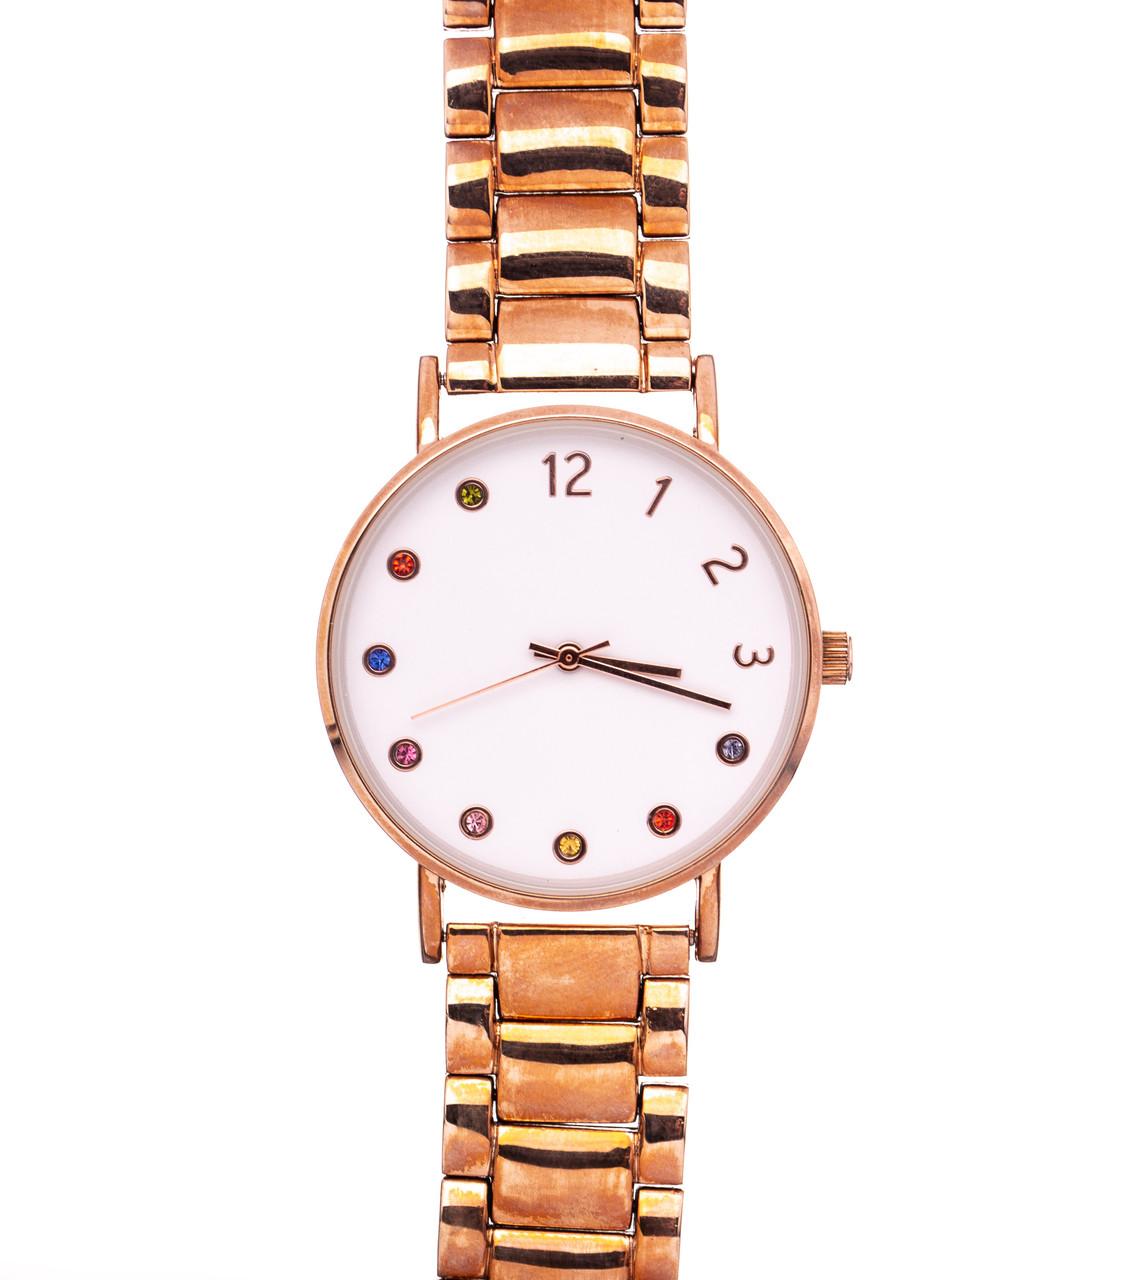 Жіночий годинник Even&Odd yp5yy-cy-en Gold